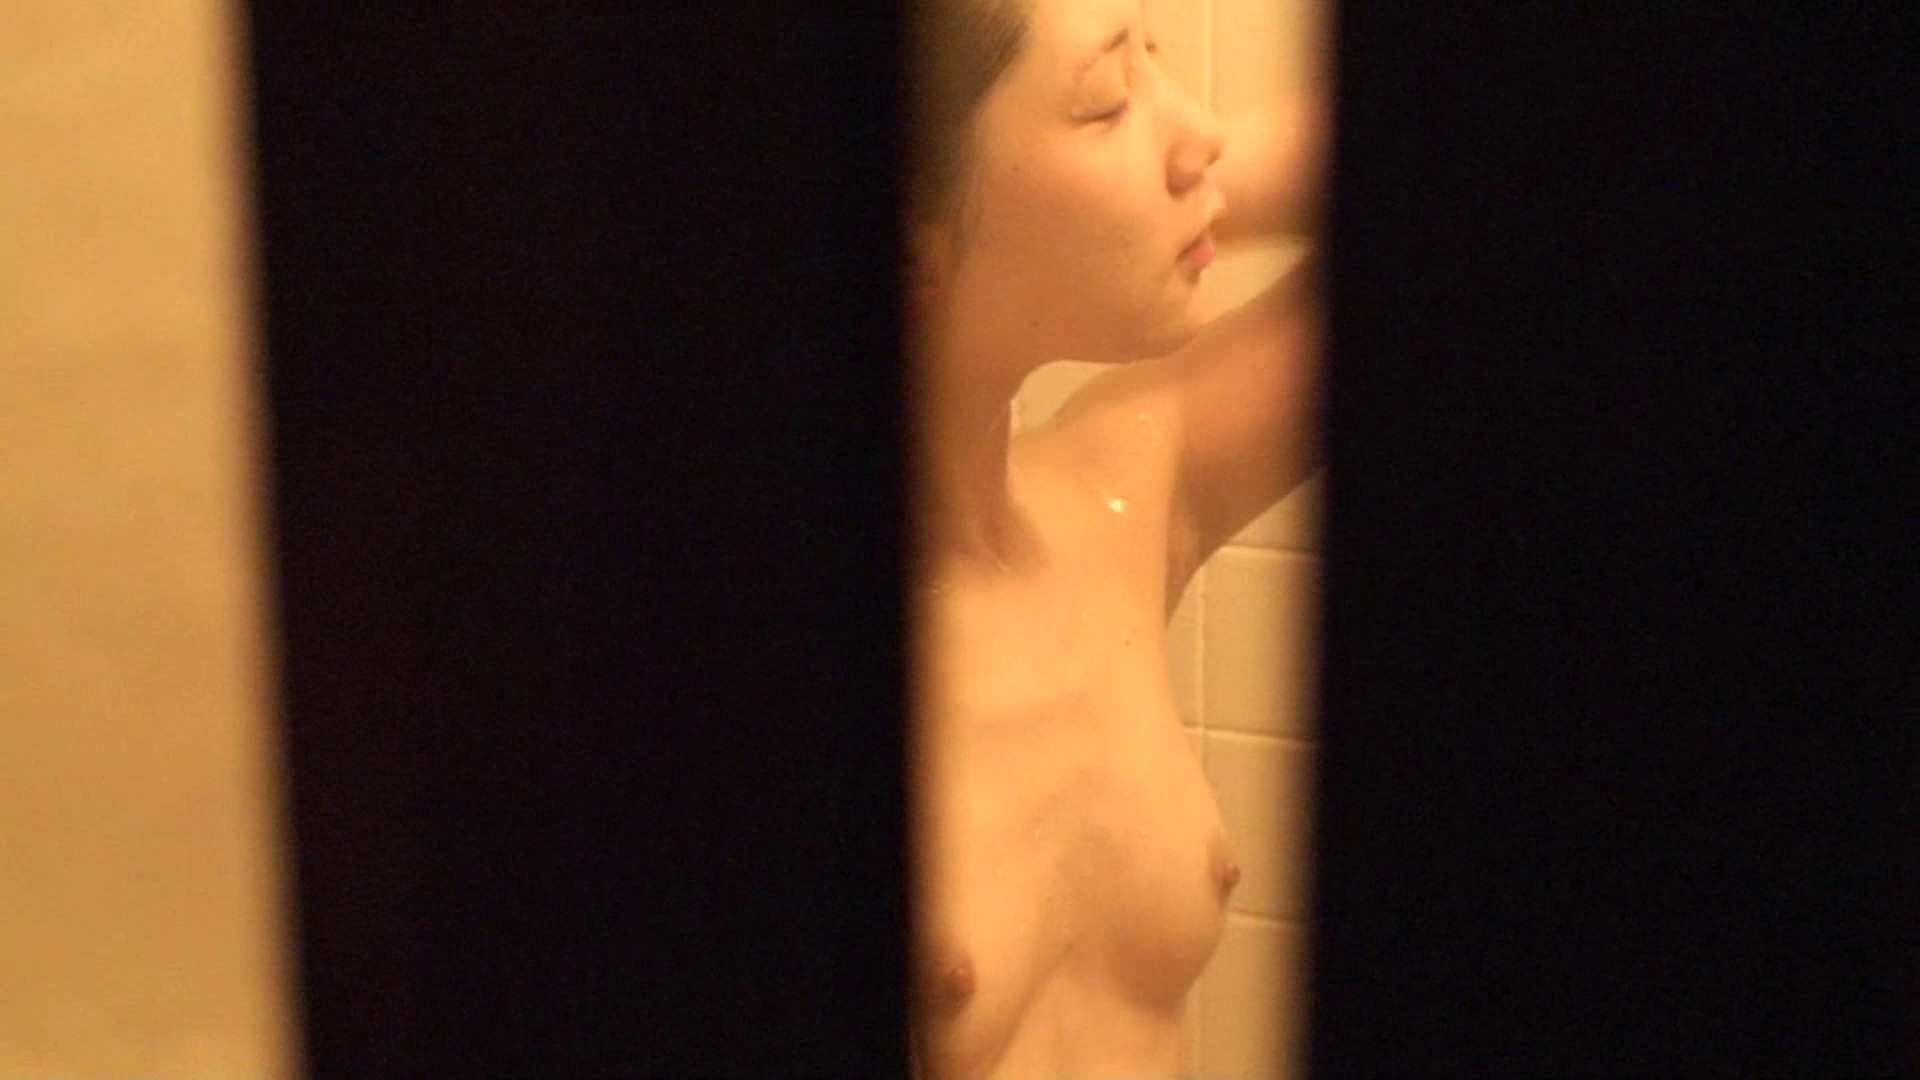 vol.02超可愛すぎる彼女の裸体をハイビジョンで!至近距離での眺め最高! 民家  54pic 40